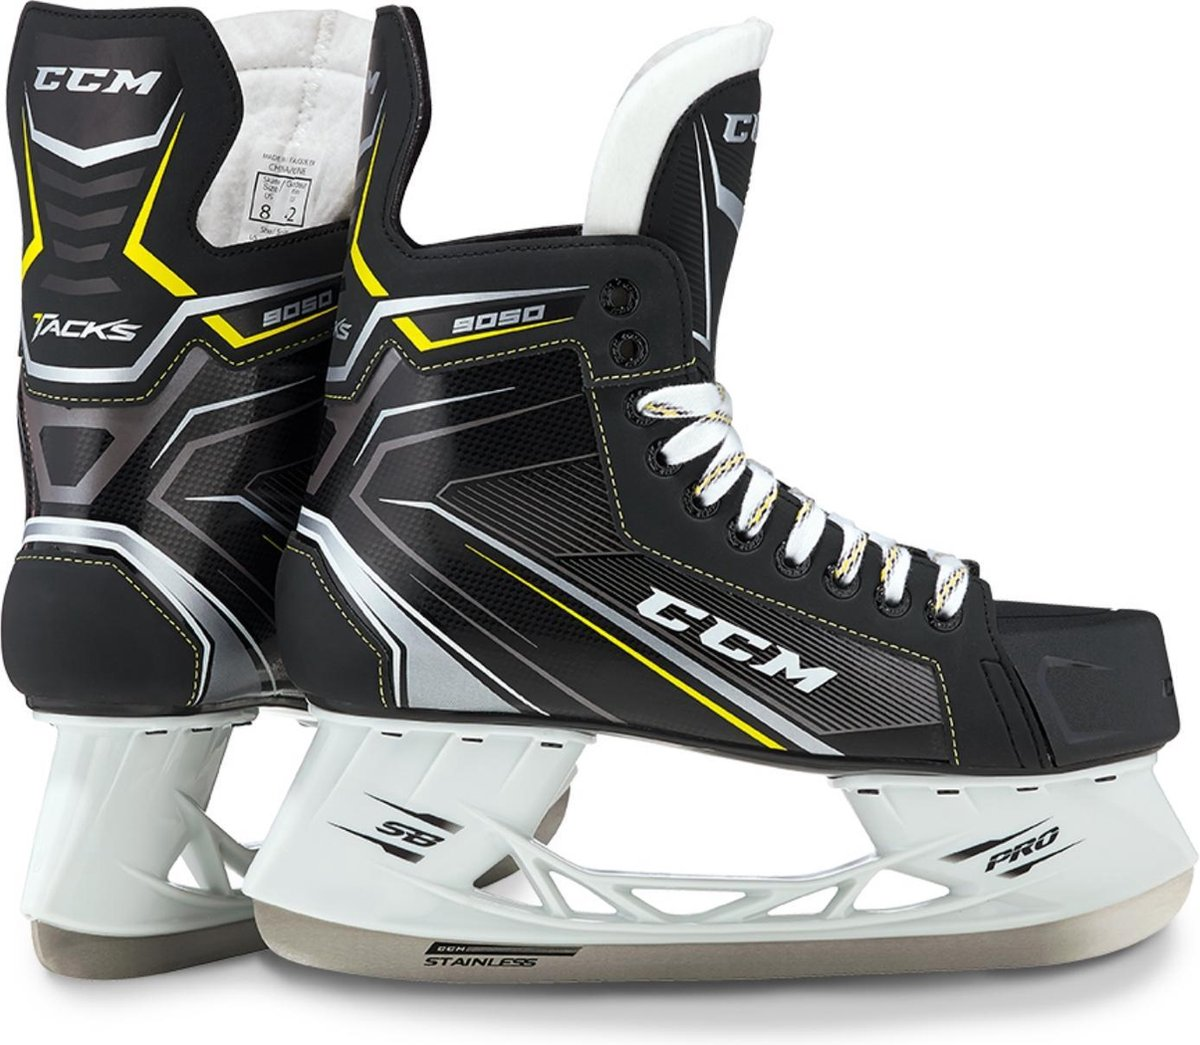 CCM IJshockeyschaatsen TACKS 9050 SR Zwart 41